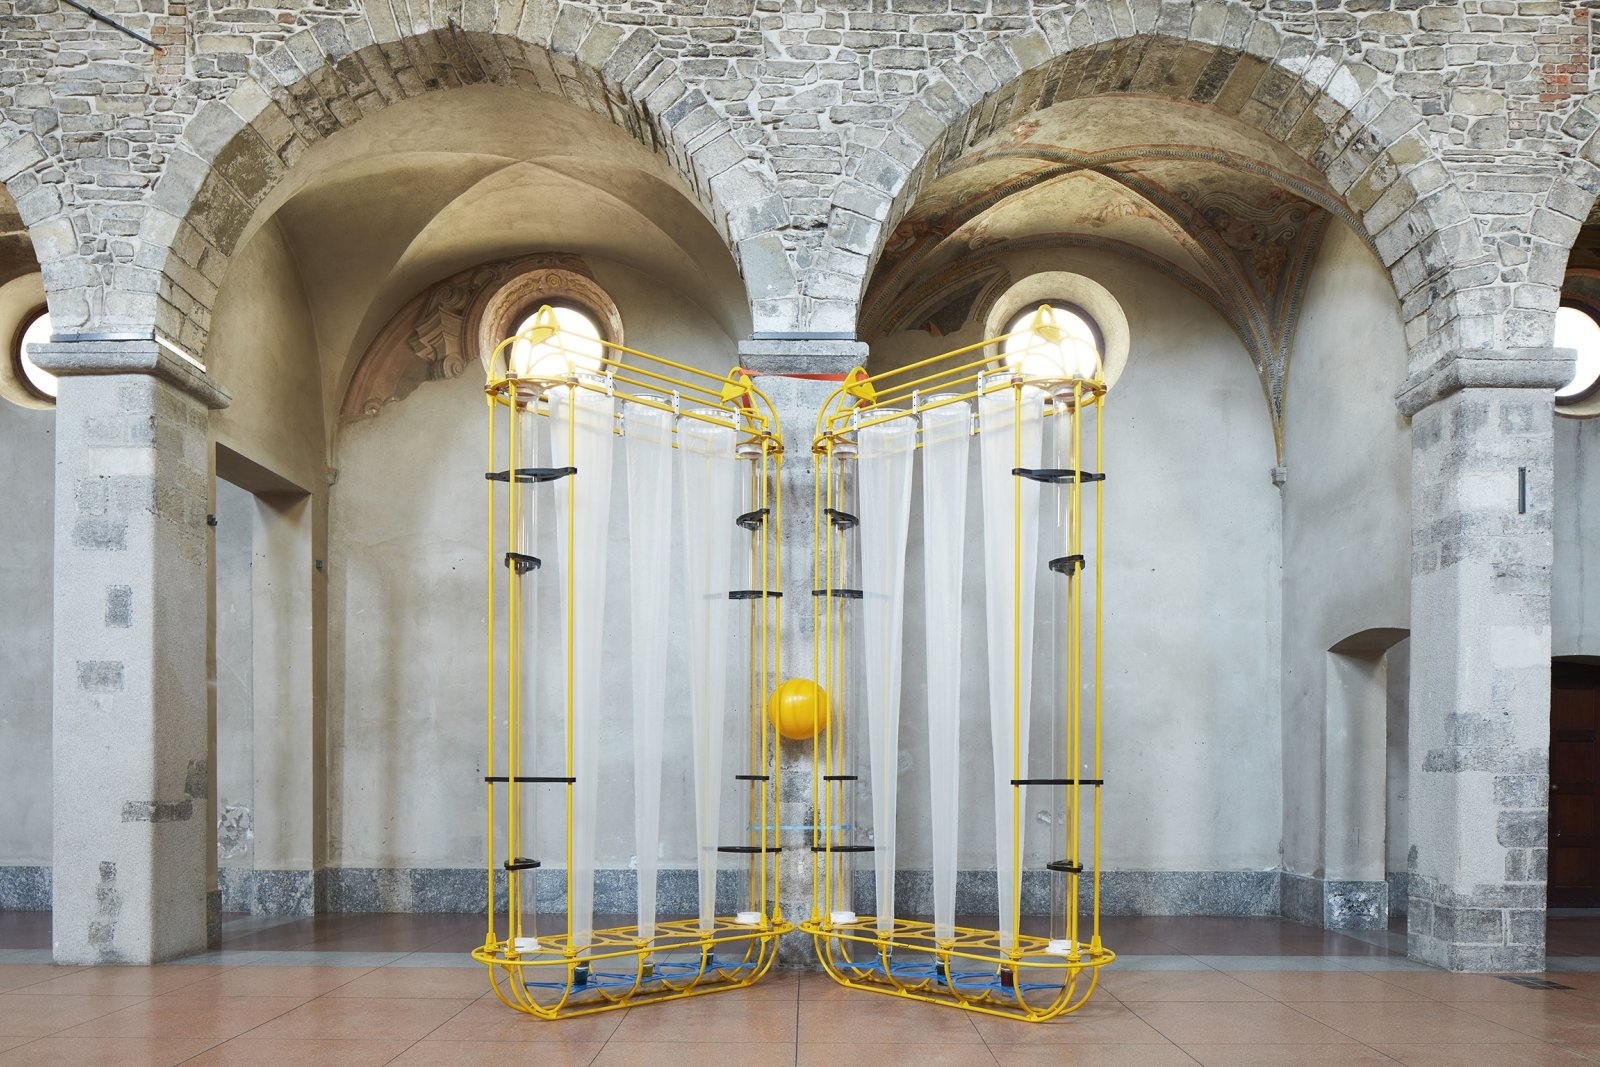 Christina Mackie, The Yellow Machines, 2015, mixed media, dimensions variable. Installation view, People Powder, ex Chiesa di San Francesco, Como, 2018 by Christina Mackie